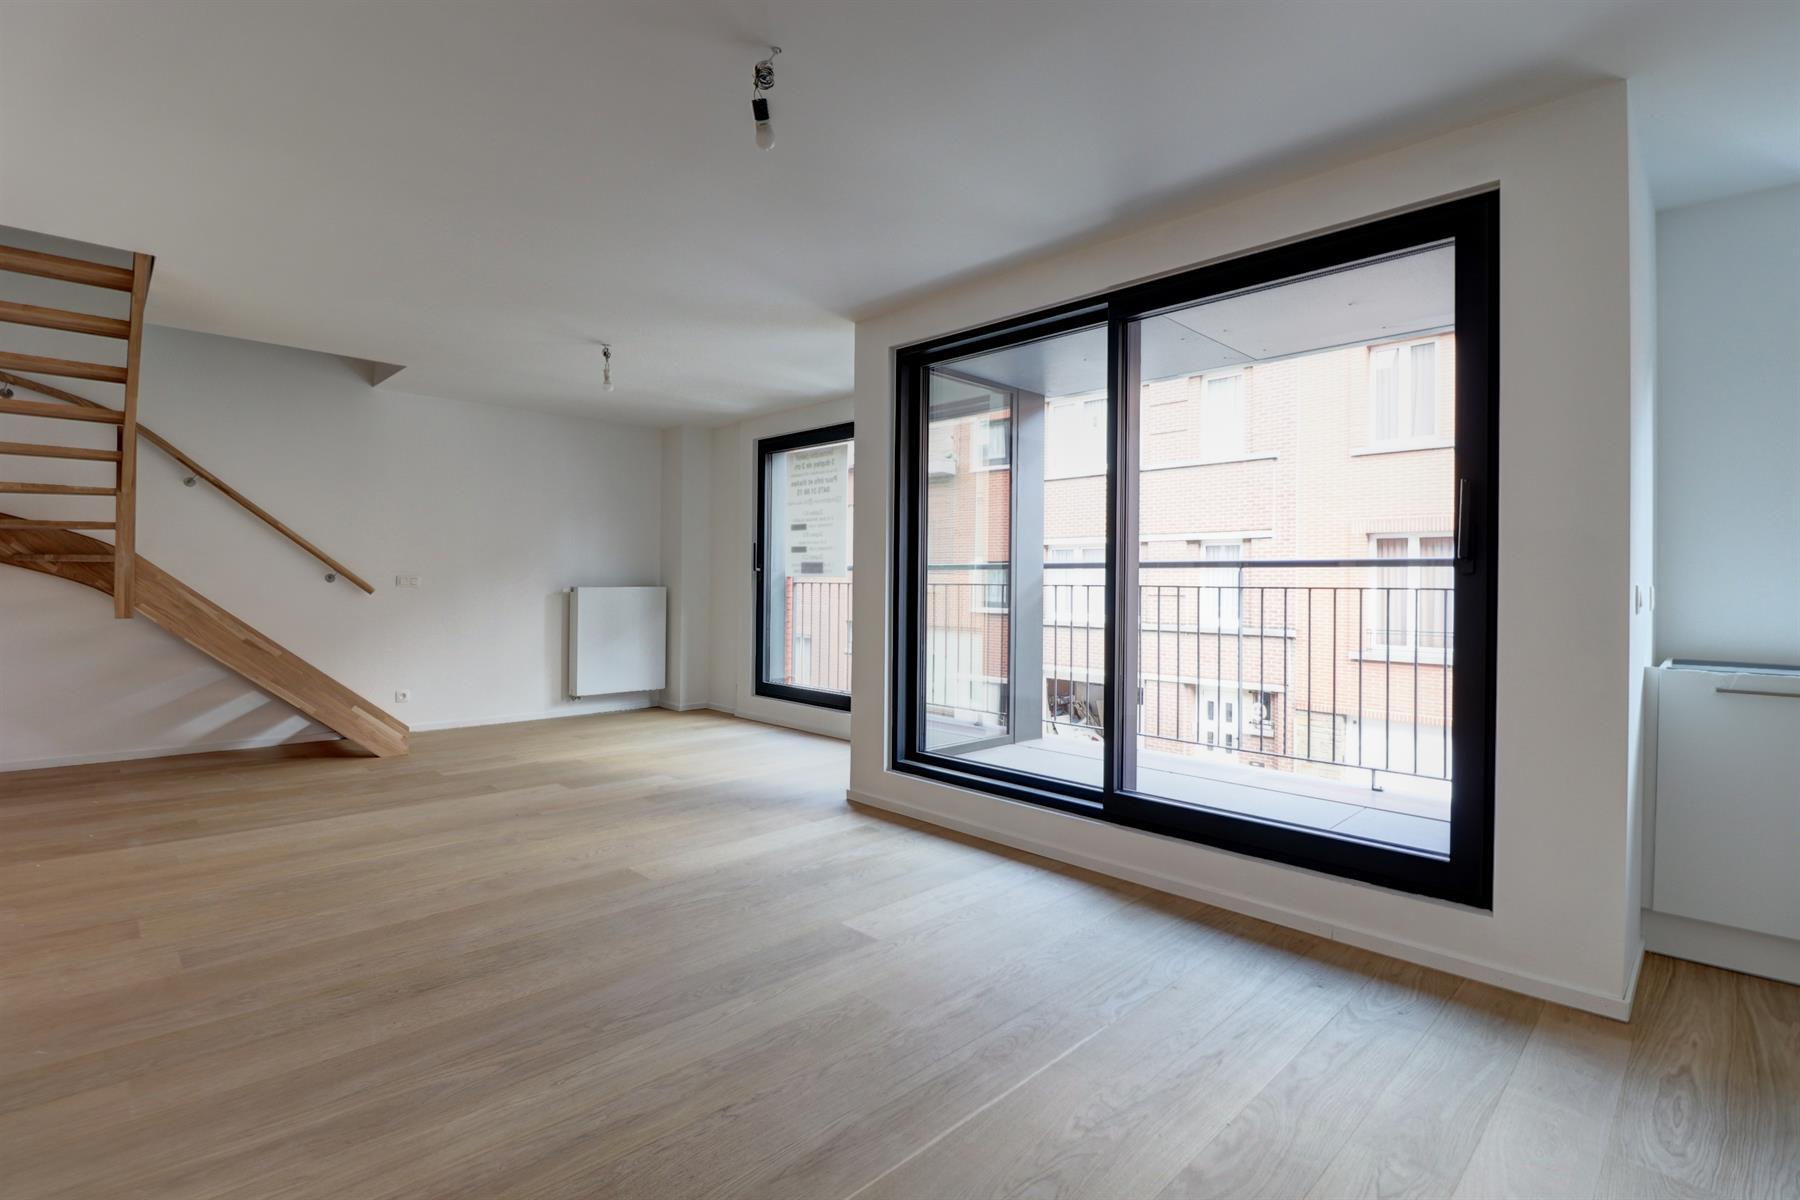 Duplex - Auderghem - #4185468-1